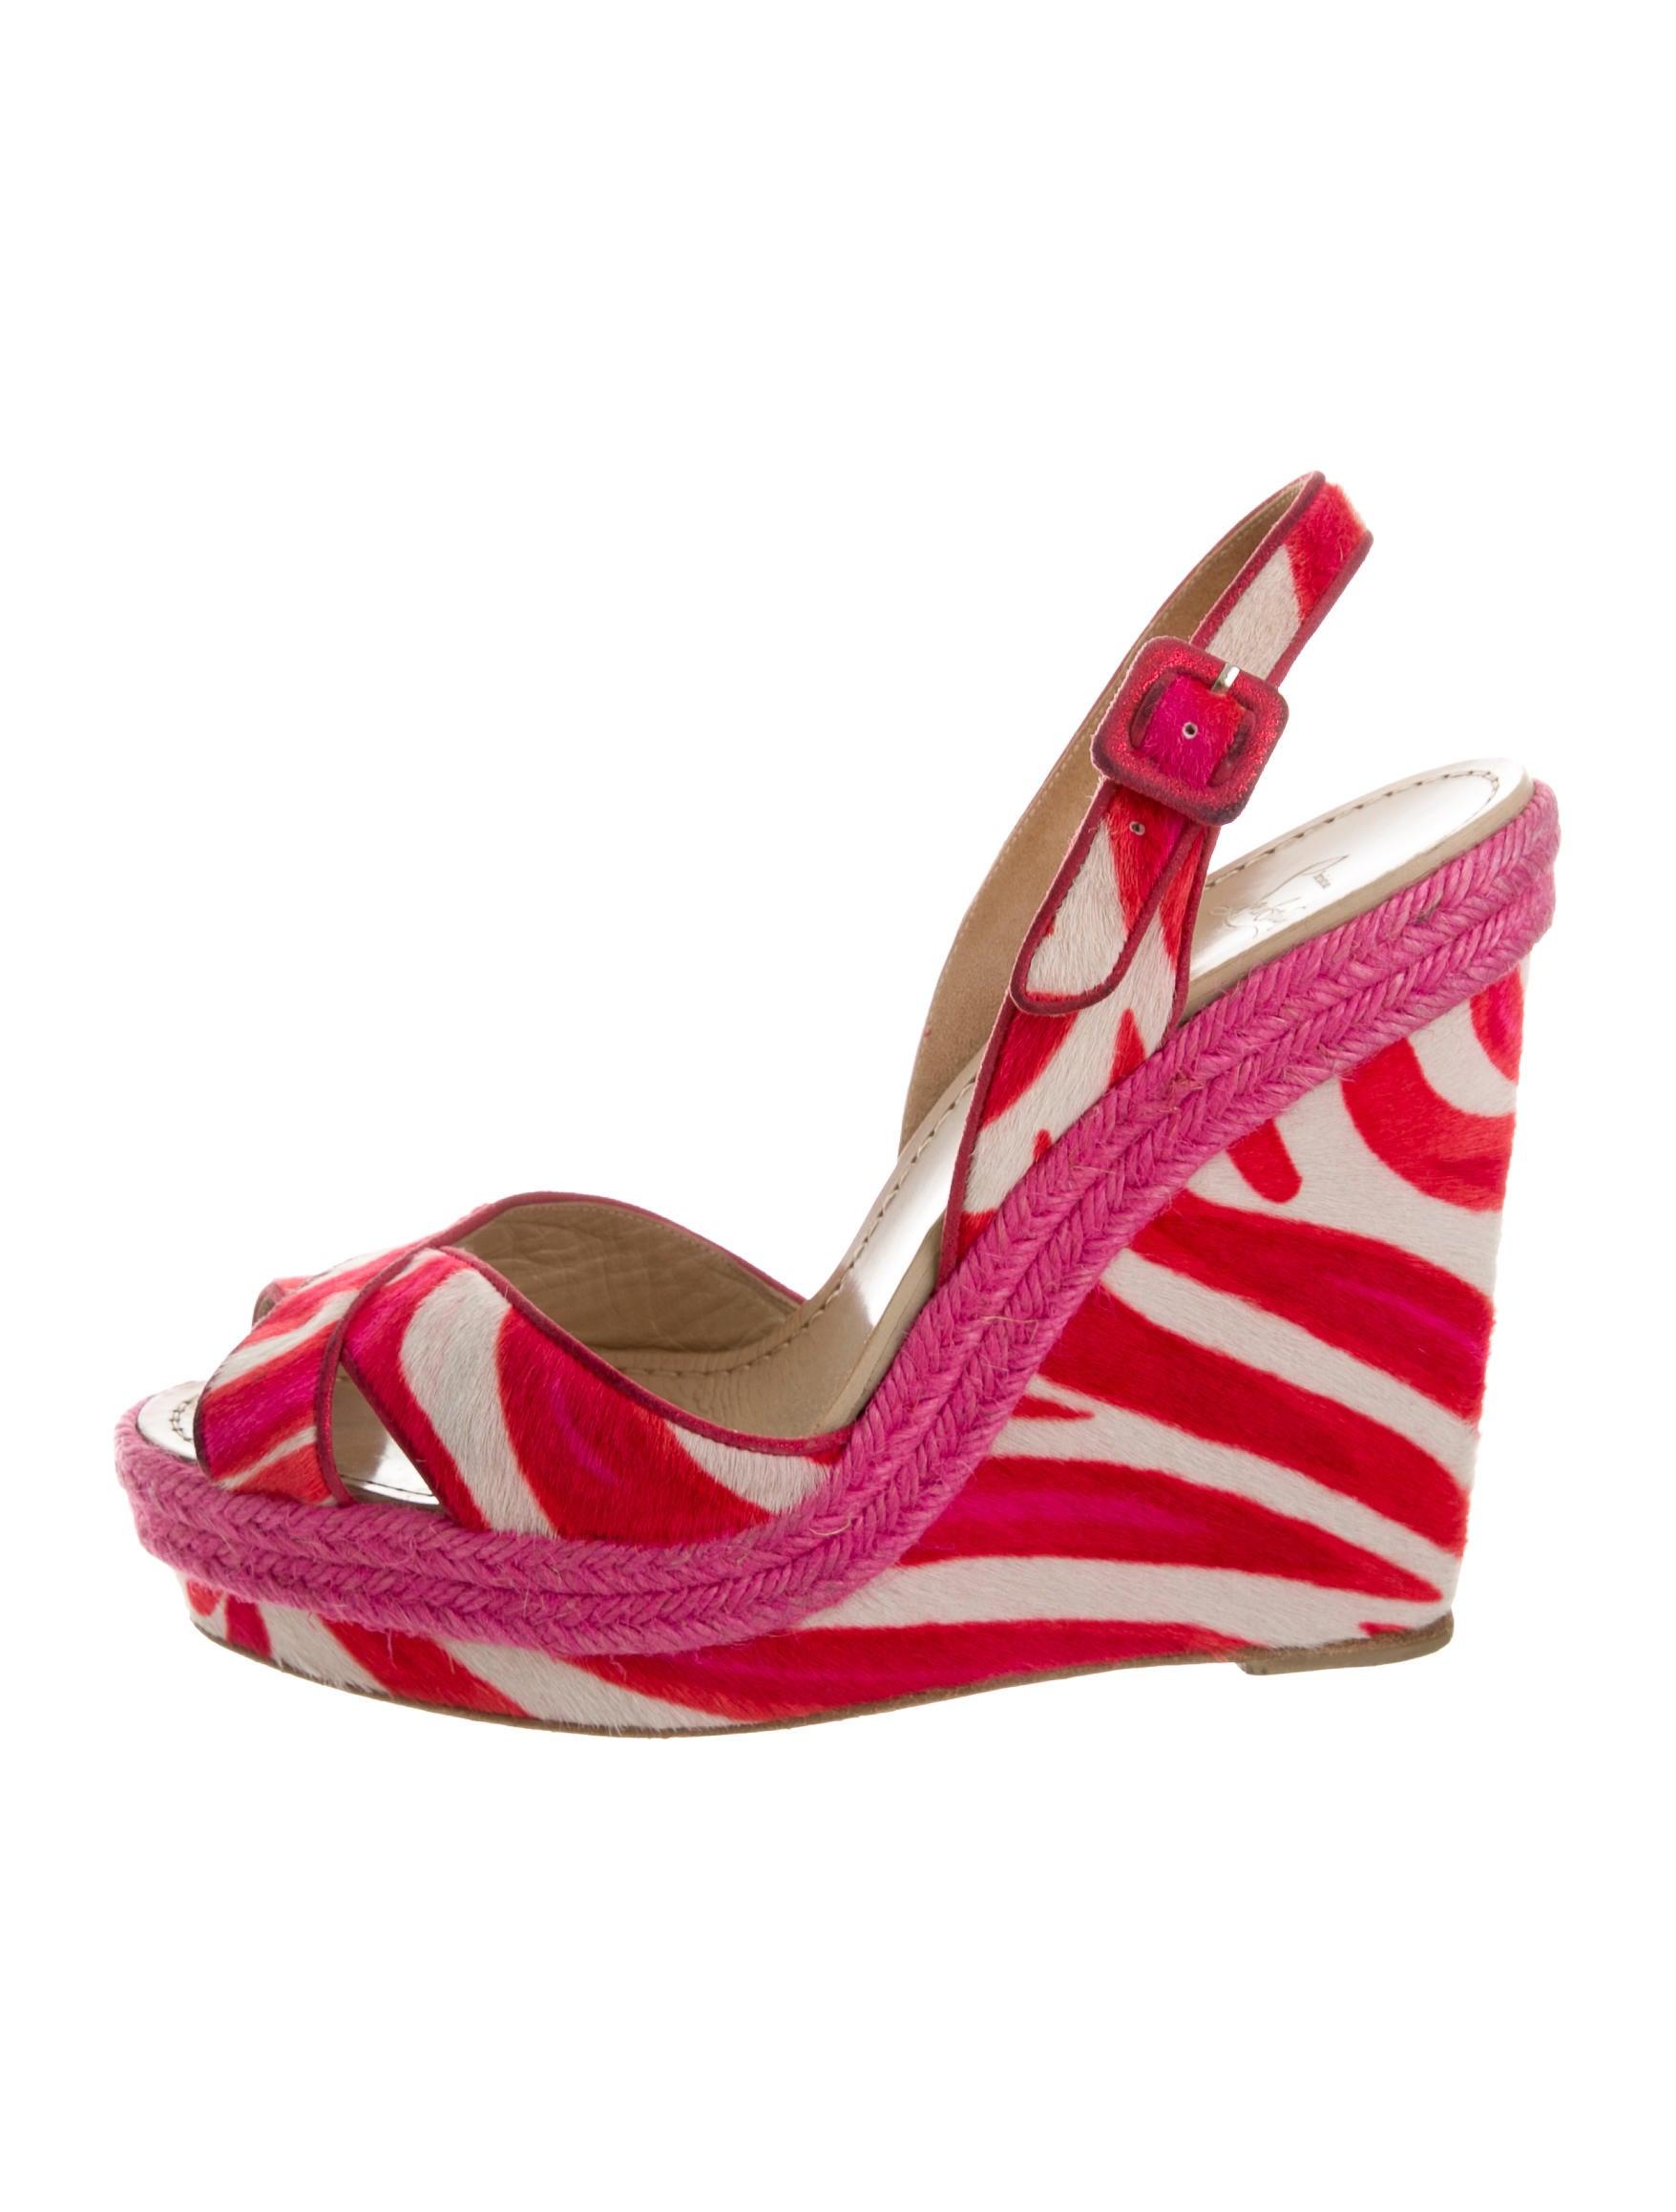 christian louboutin zebra print ponyhair wedges shoes